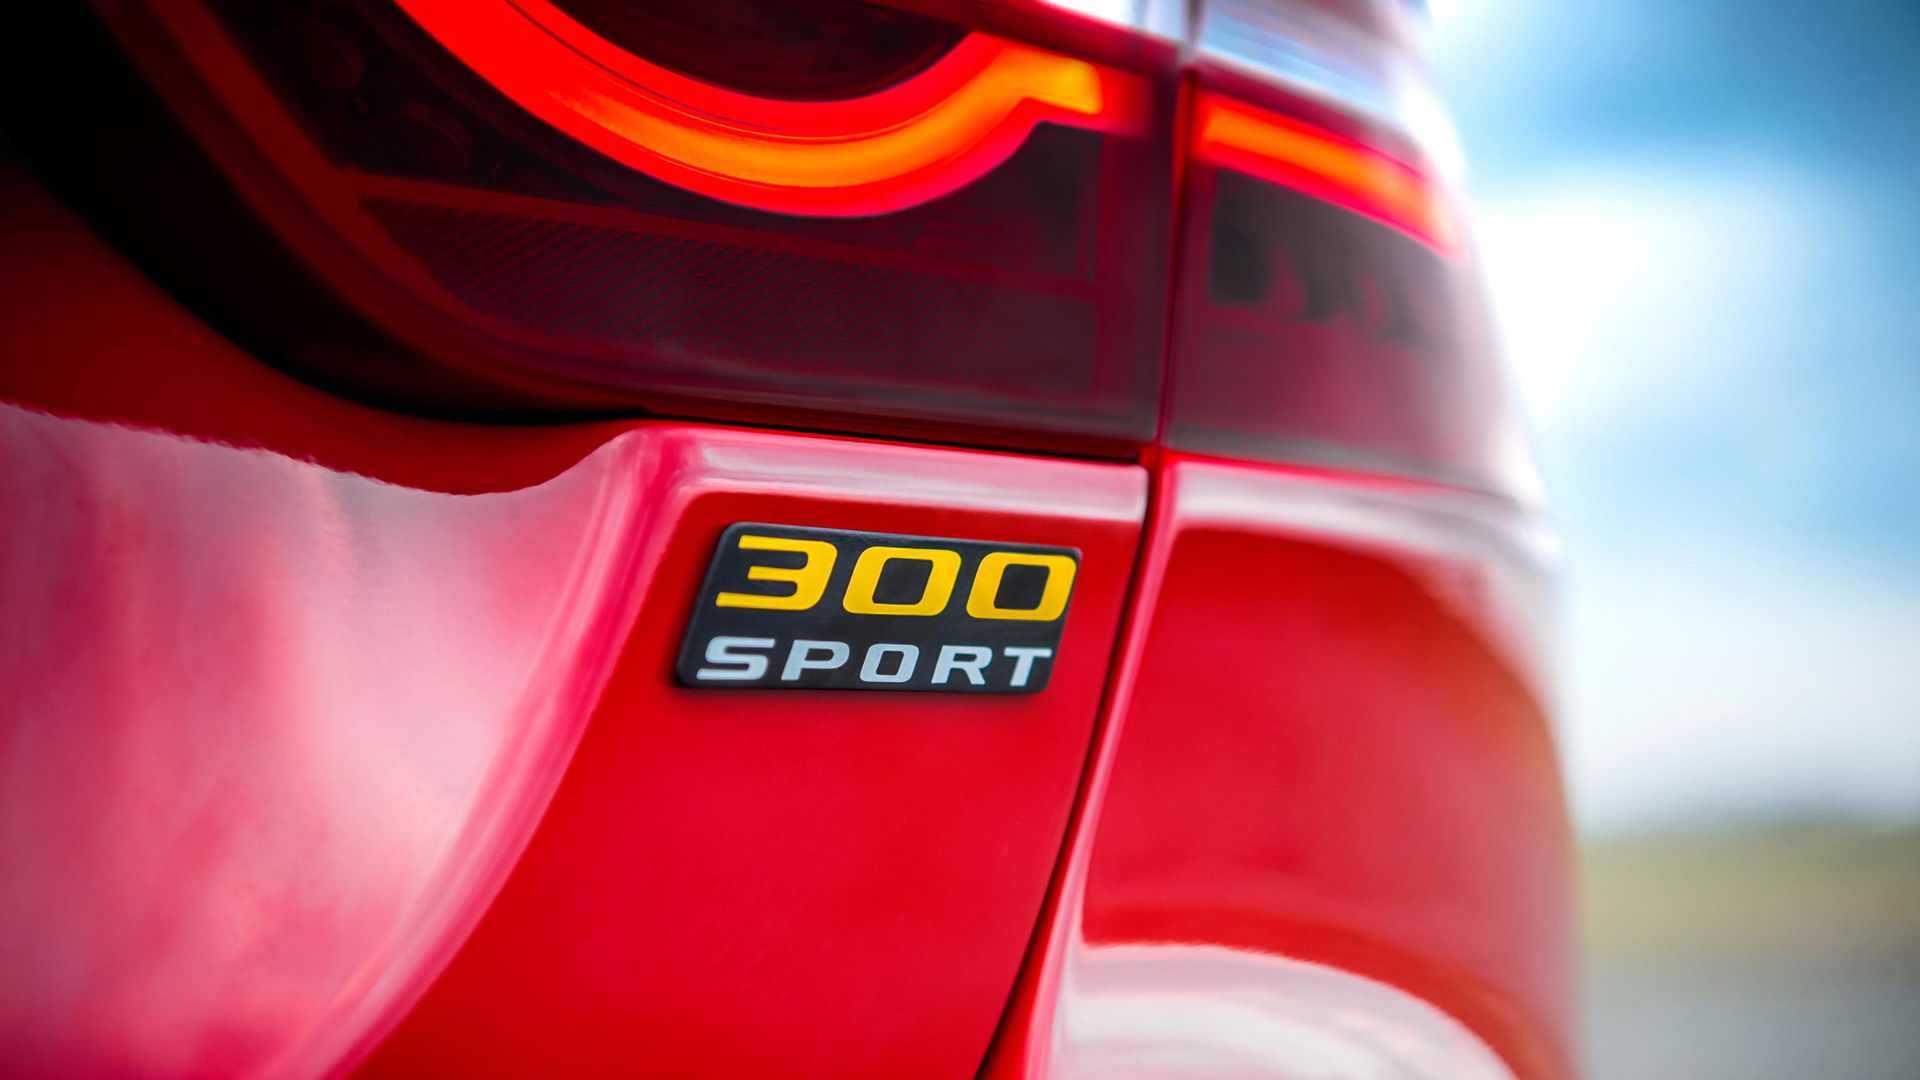 2019 Jaguar XE 300 Sport